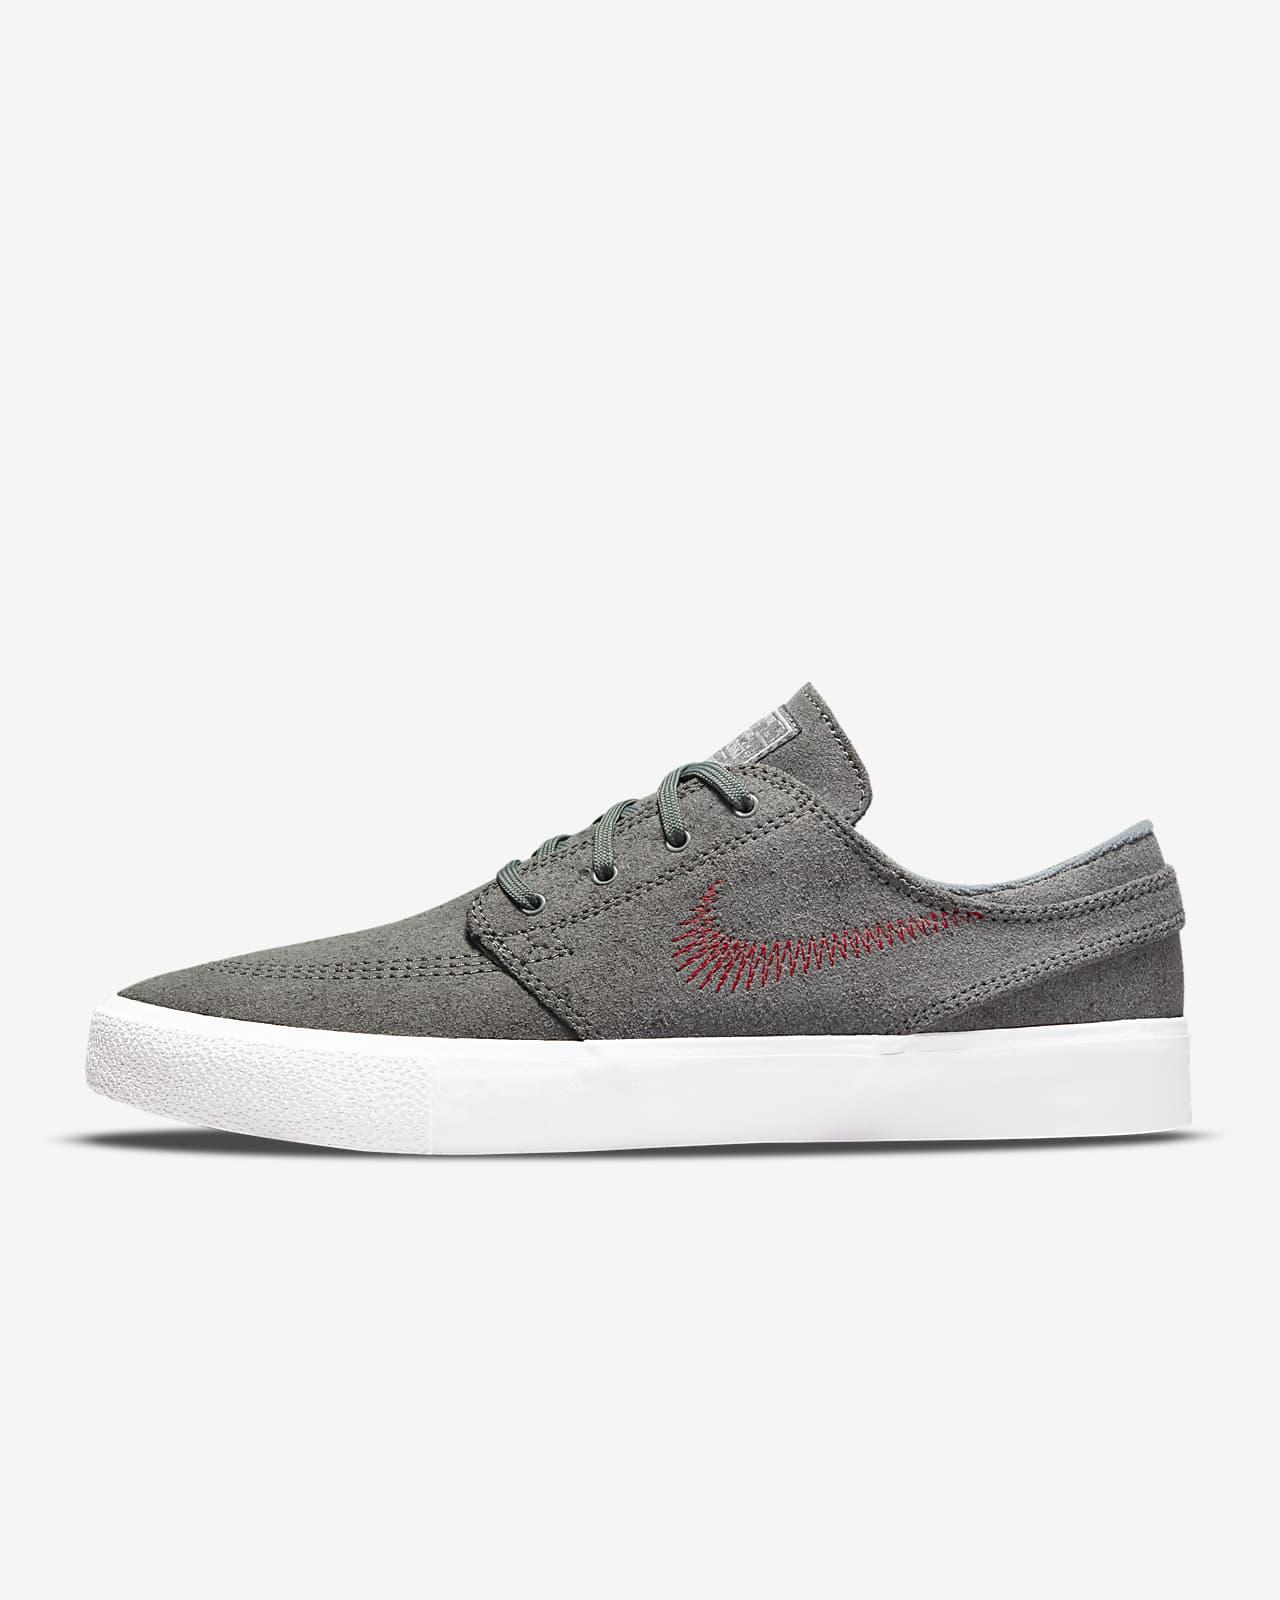 Nike SB Zoom Stefan Janoski FL RM Skate Shoe